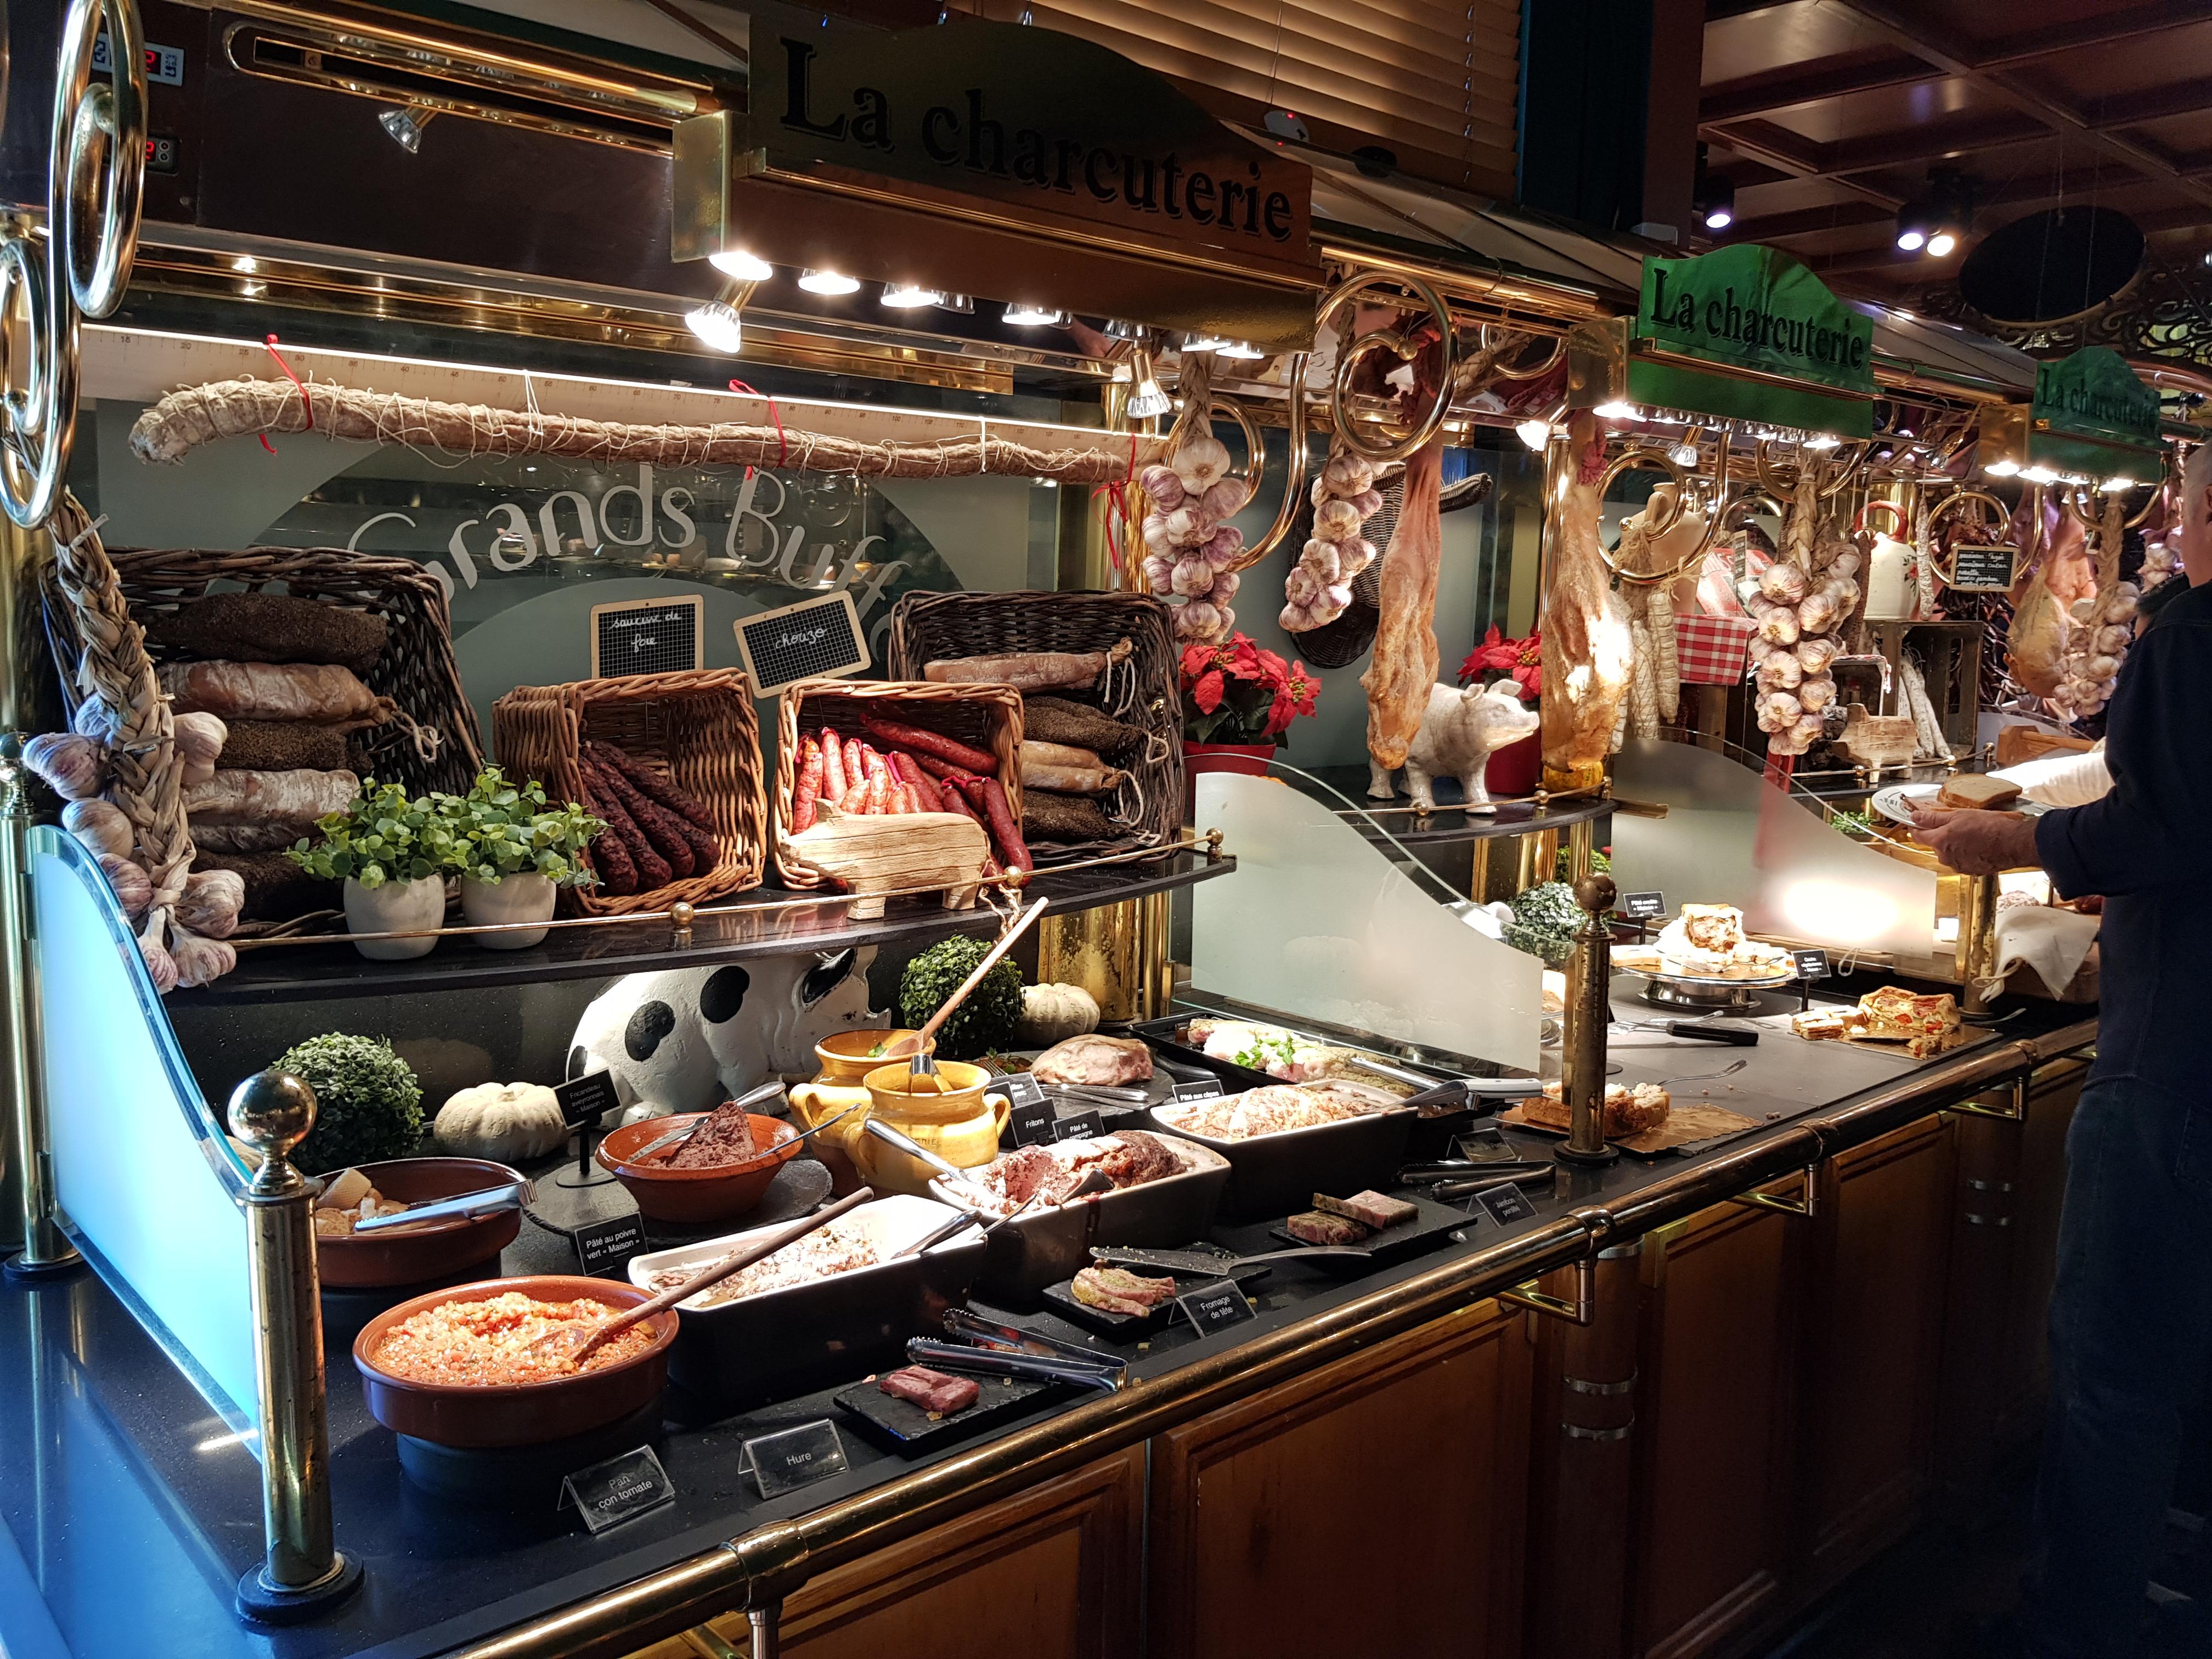 Restaurant Les grands buffets Narbonne